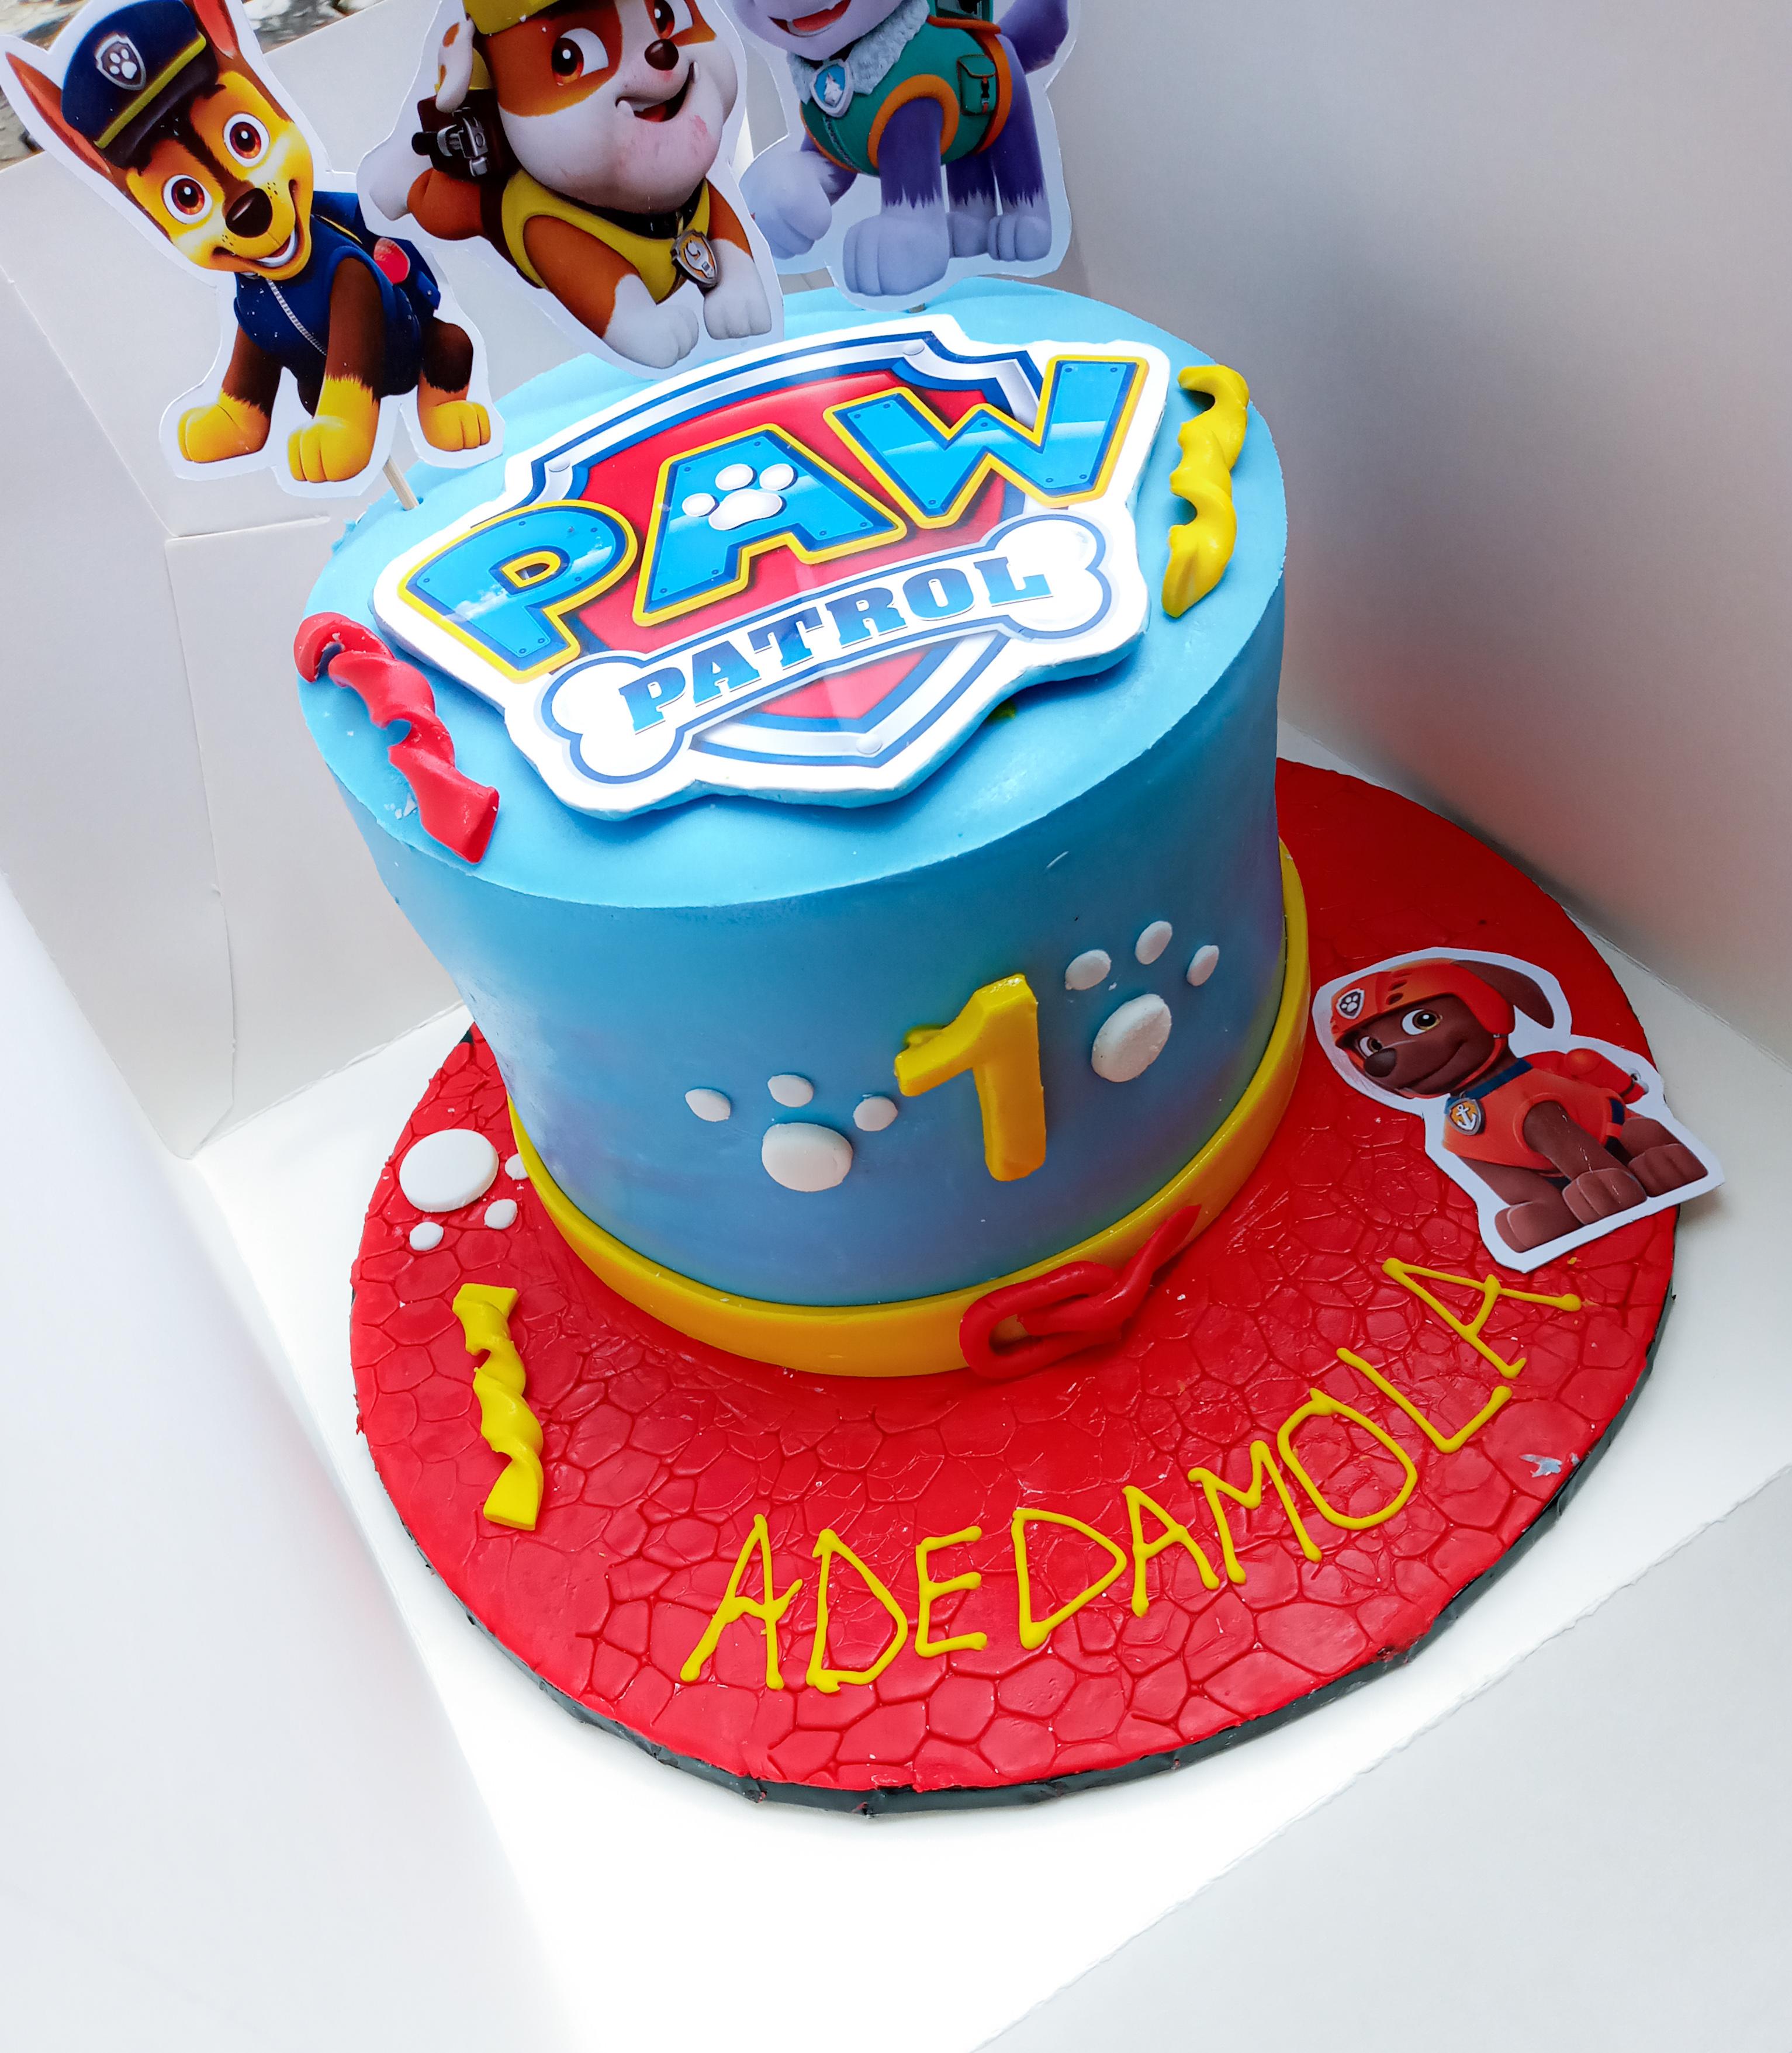 Kids Cakes - Available in Vanilla, Red Velvet, Chocolate, etc.